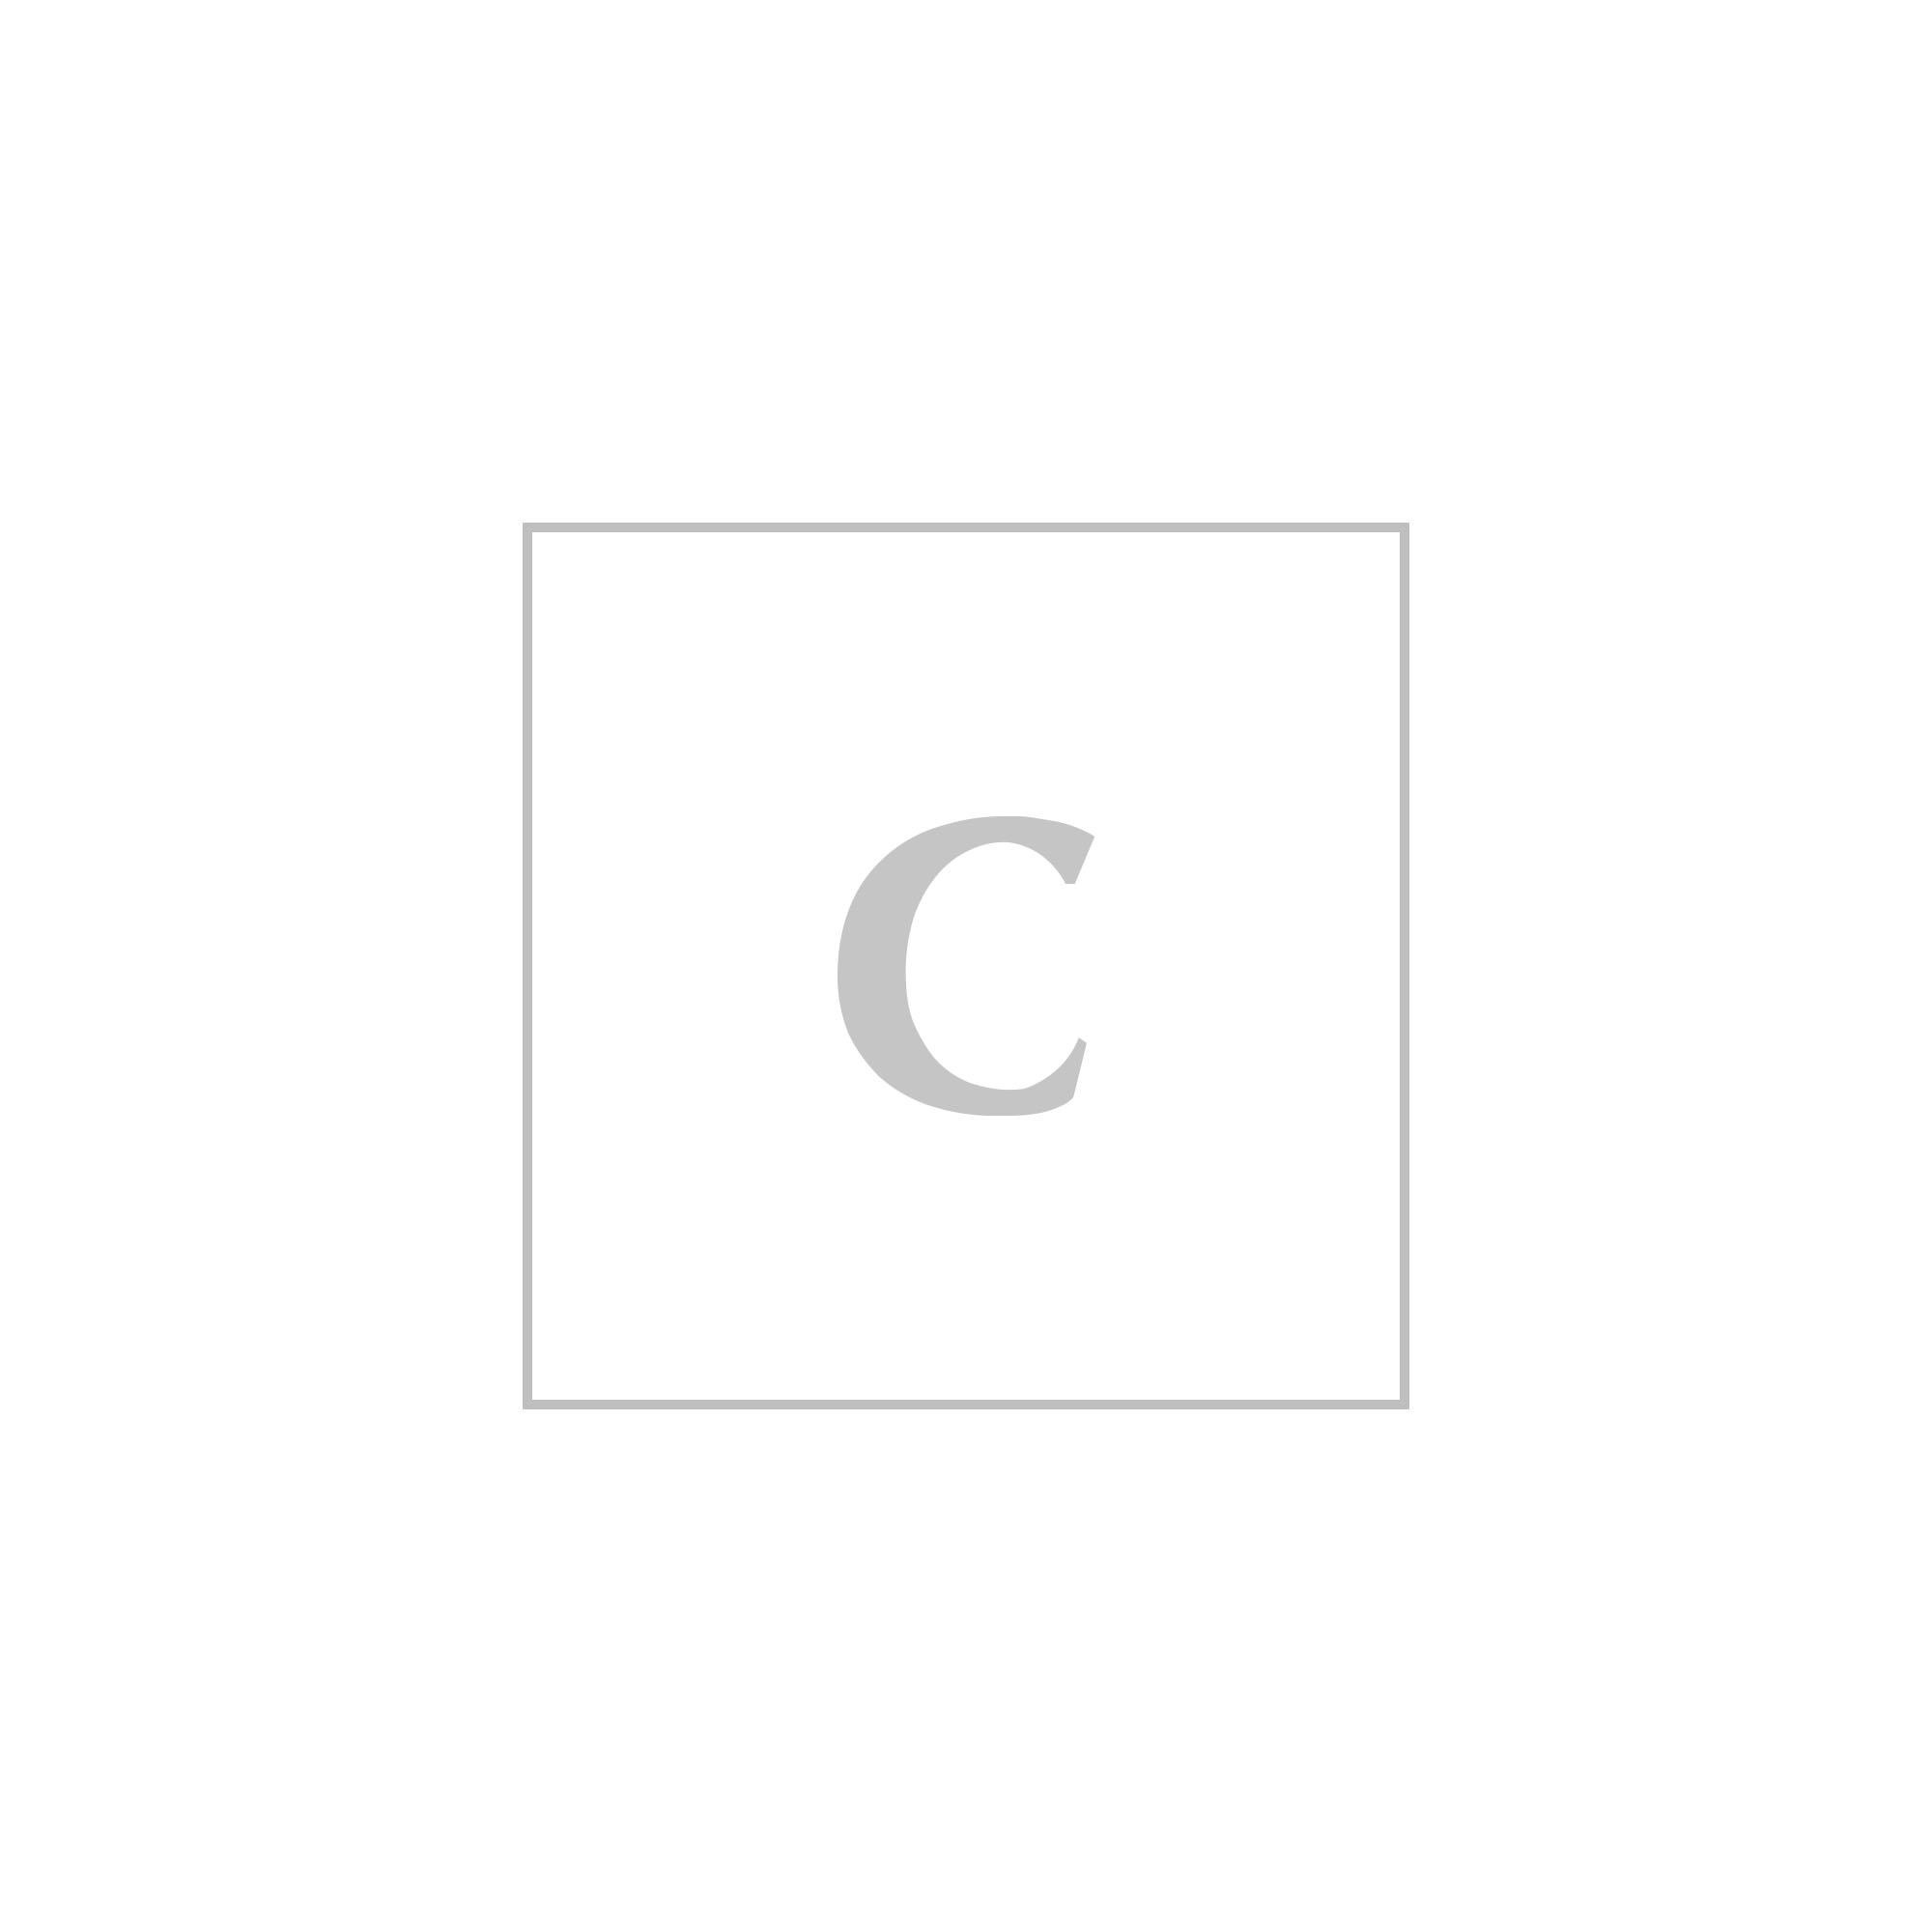 Stella mccartney borsa tiny falabella metallic crackl